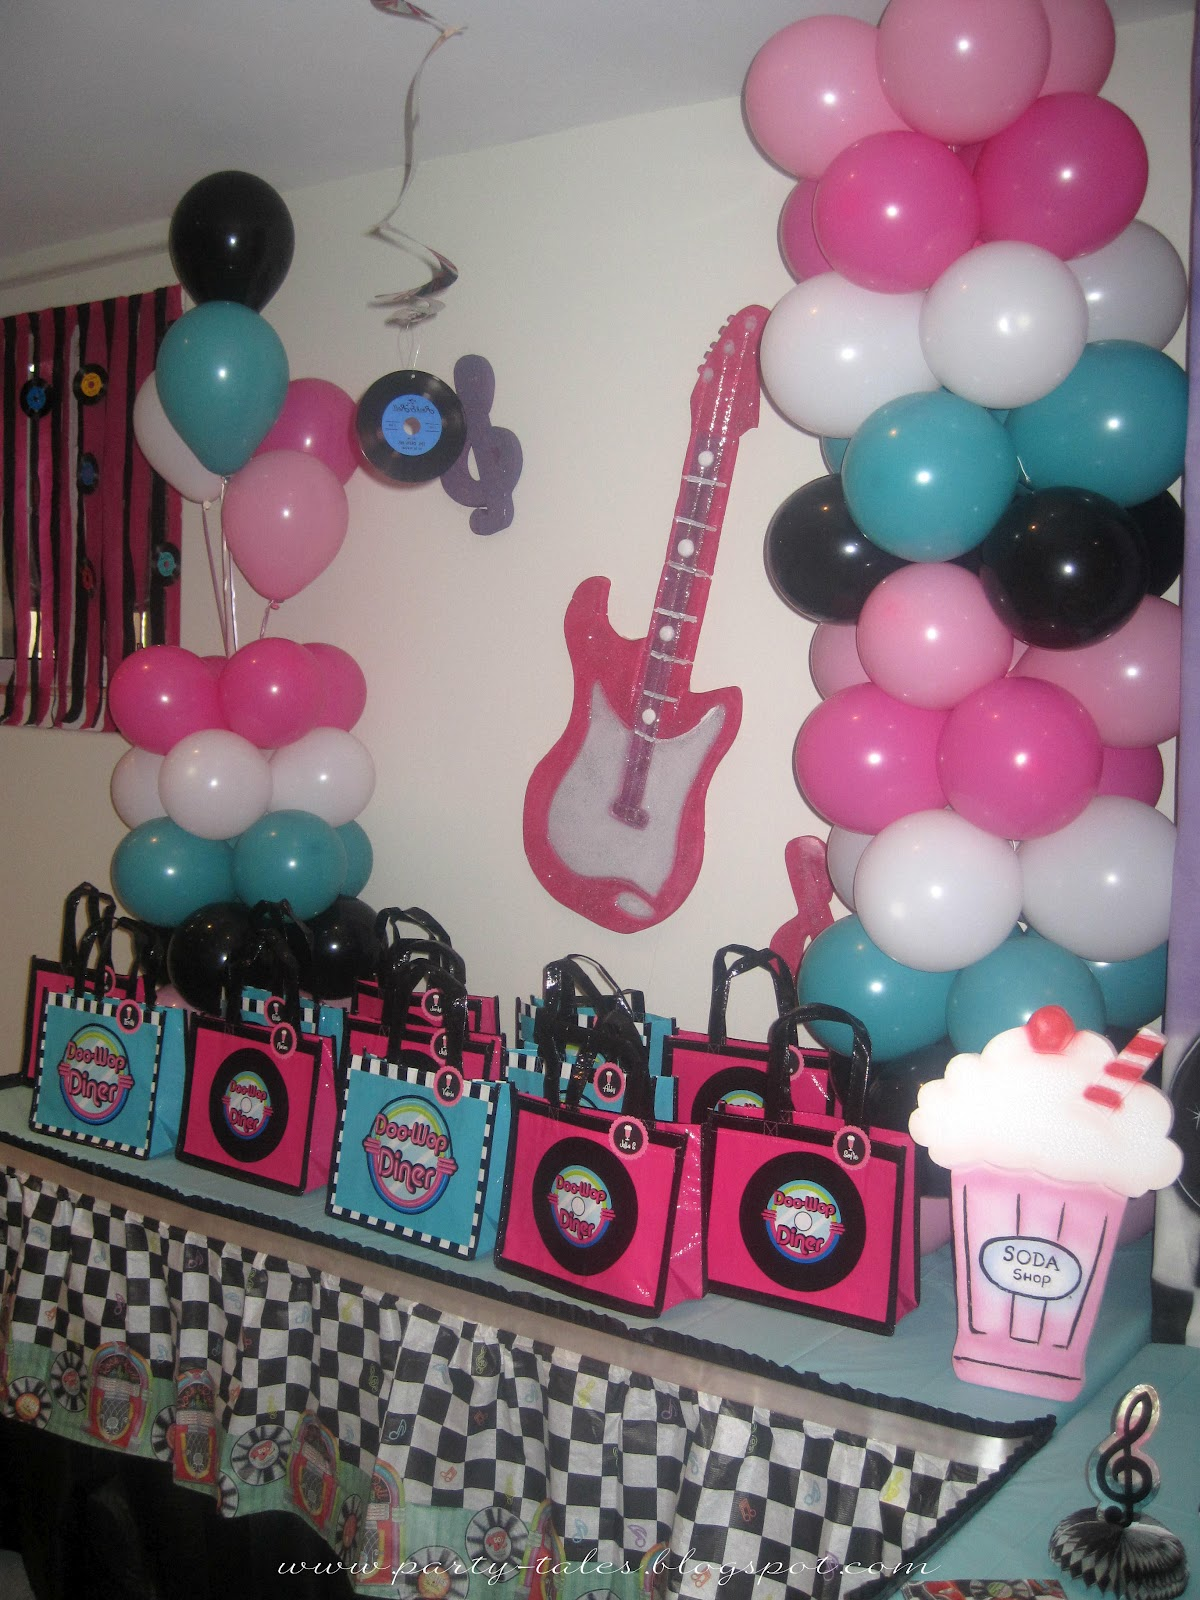 Sock Hop Cake Decorations